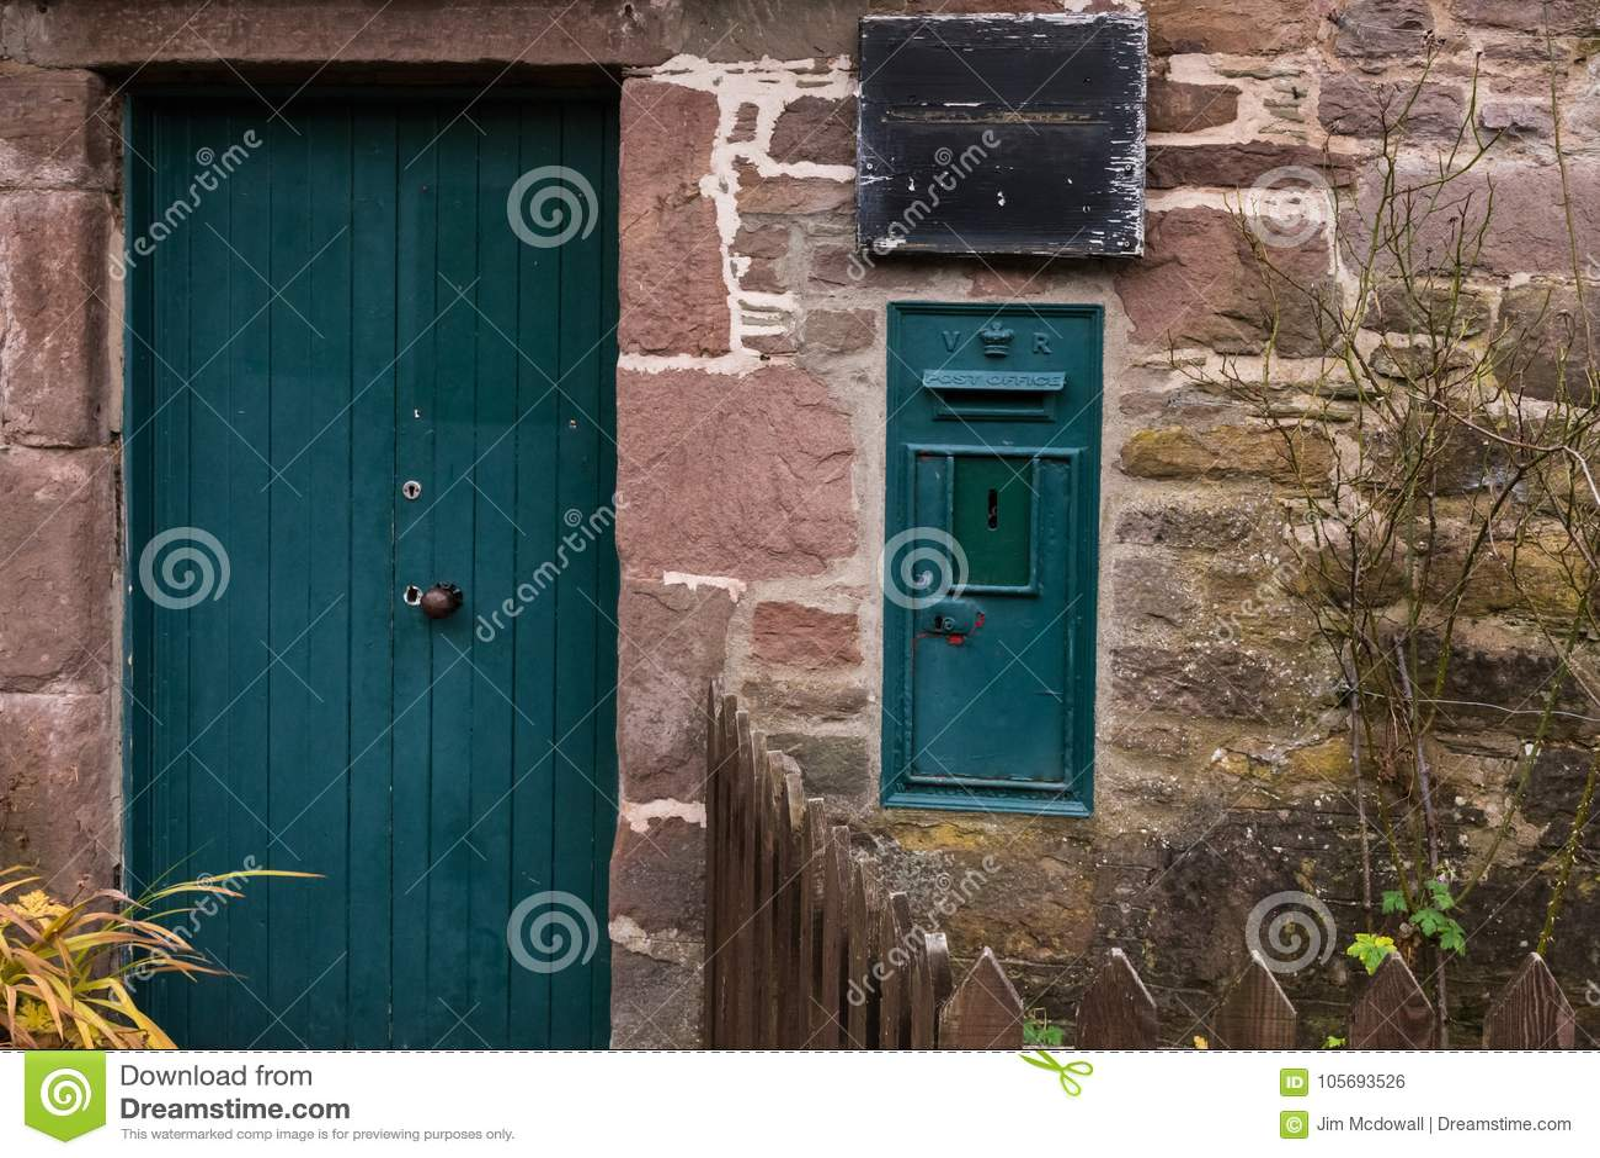 Old Queen Vistoria Post Box In Royal Glamis Village Scotland